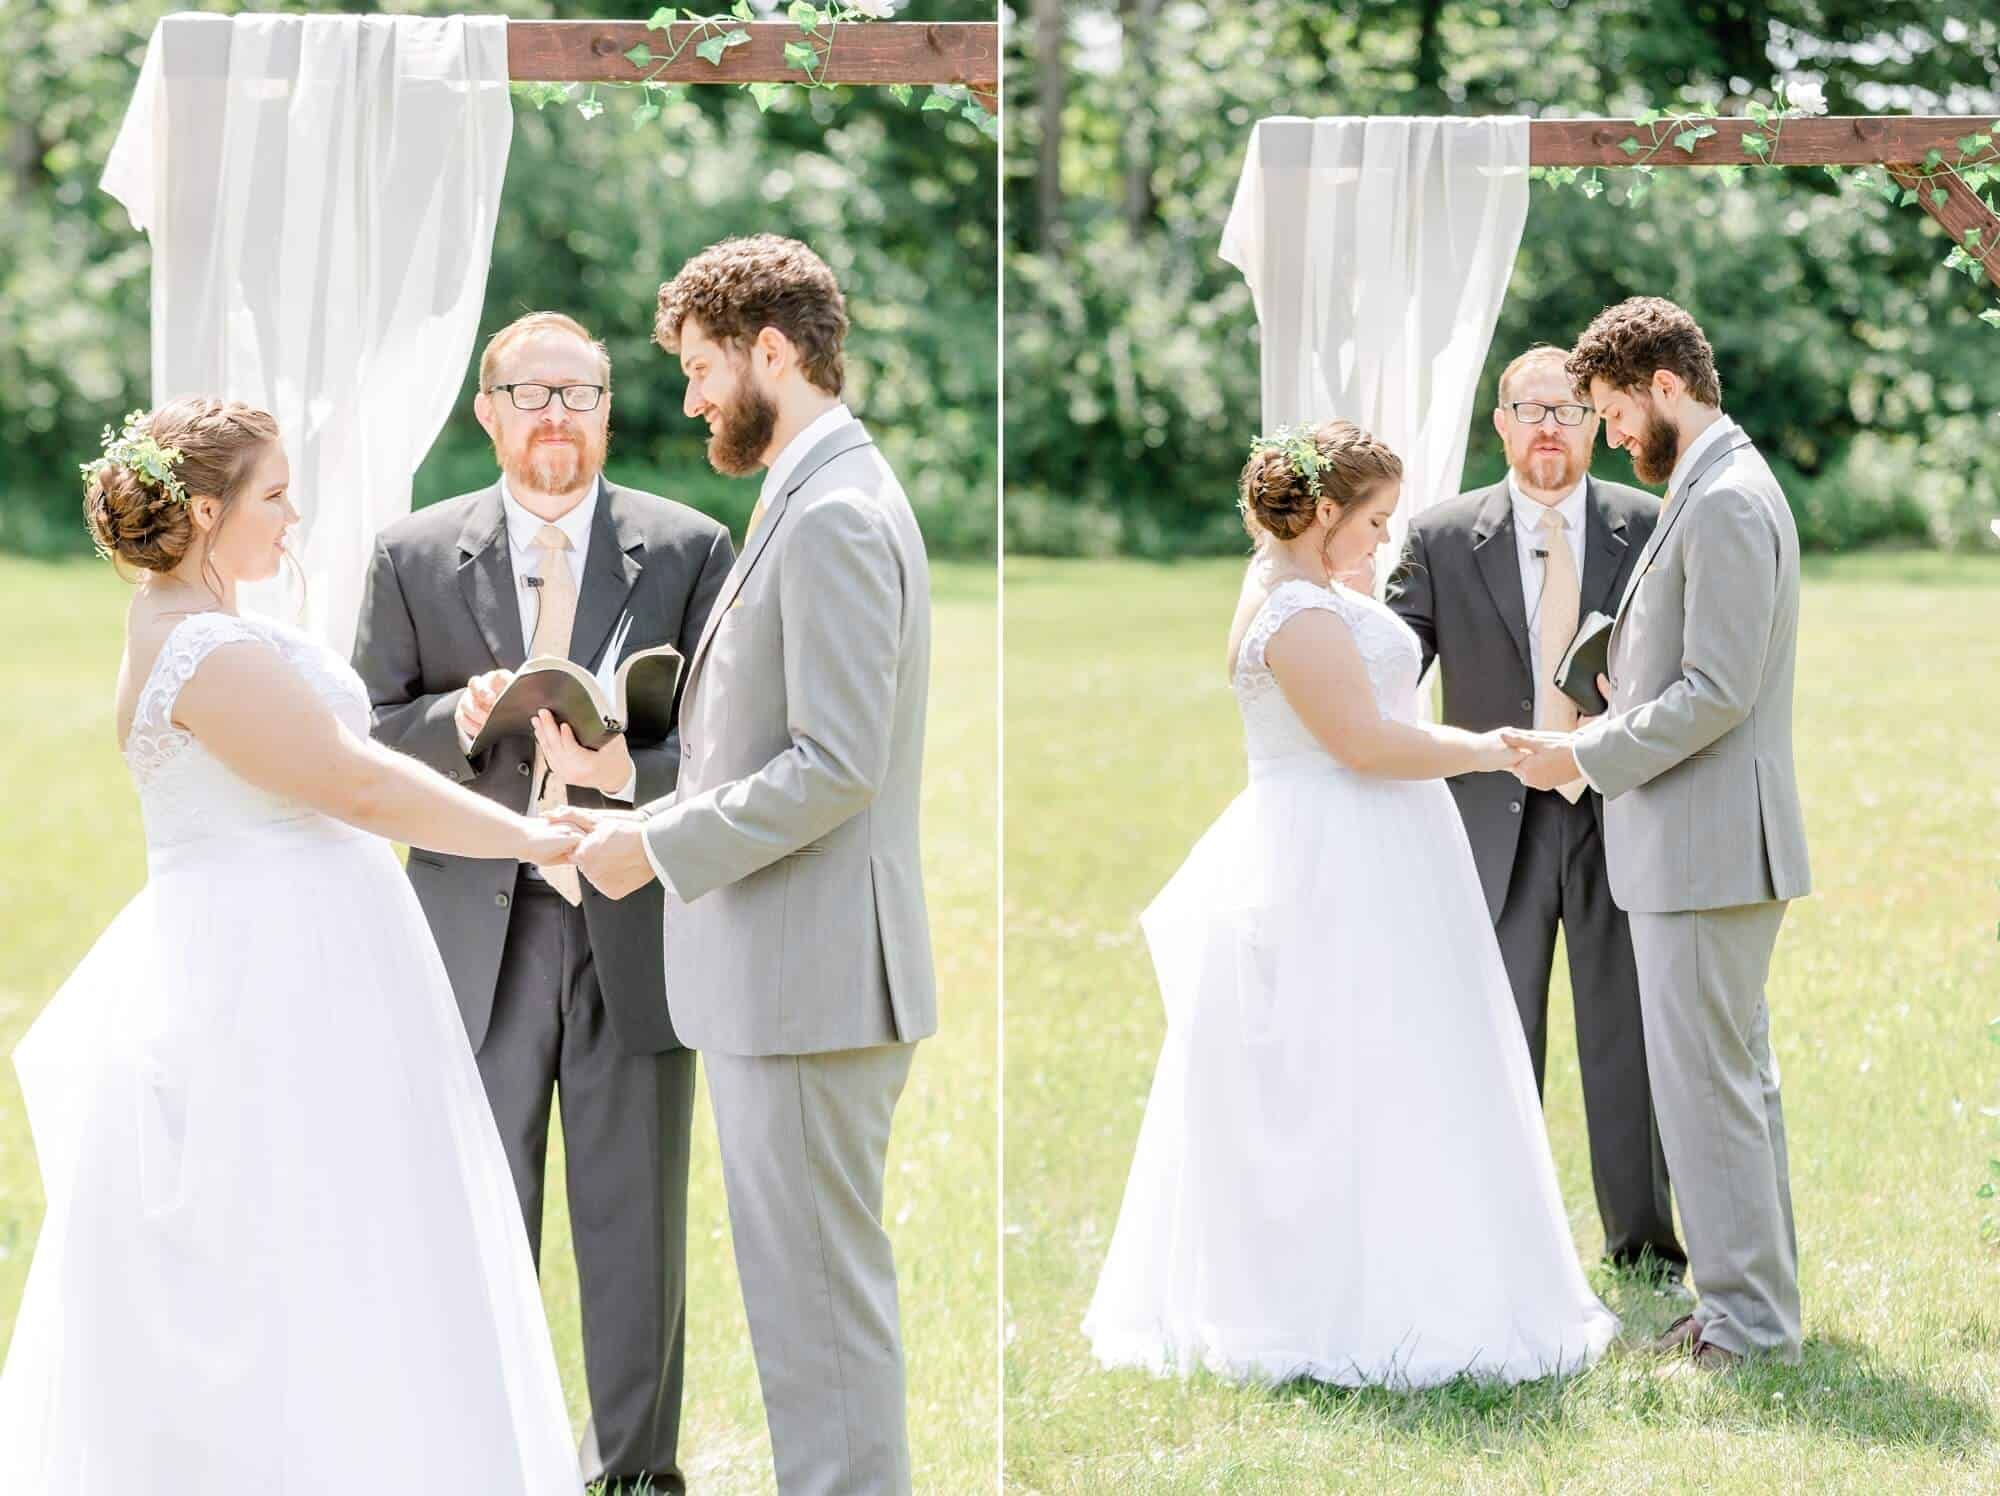 backyard wedding ceremony mansfield ohio photographer tiffany murray